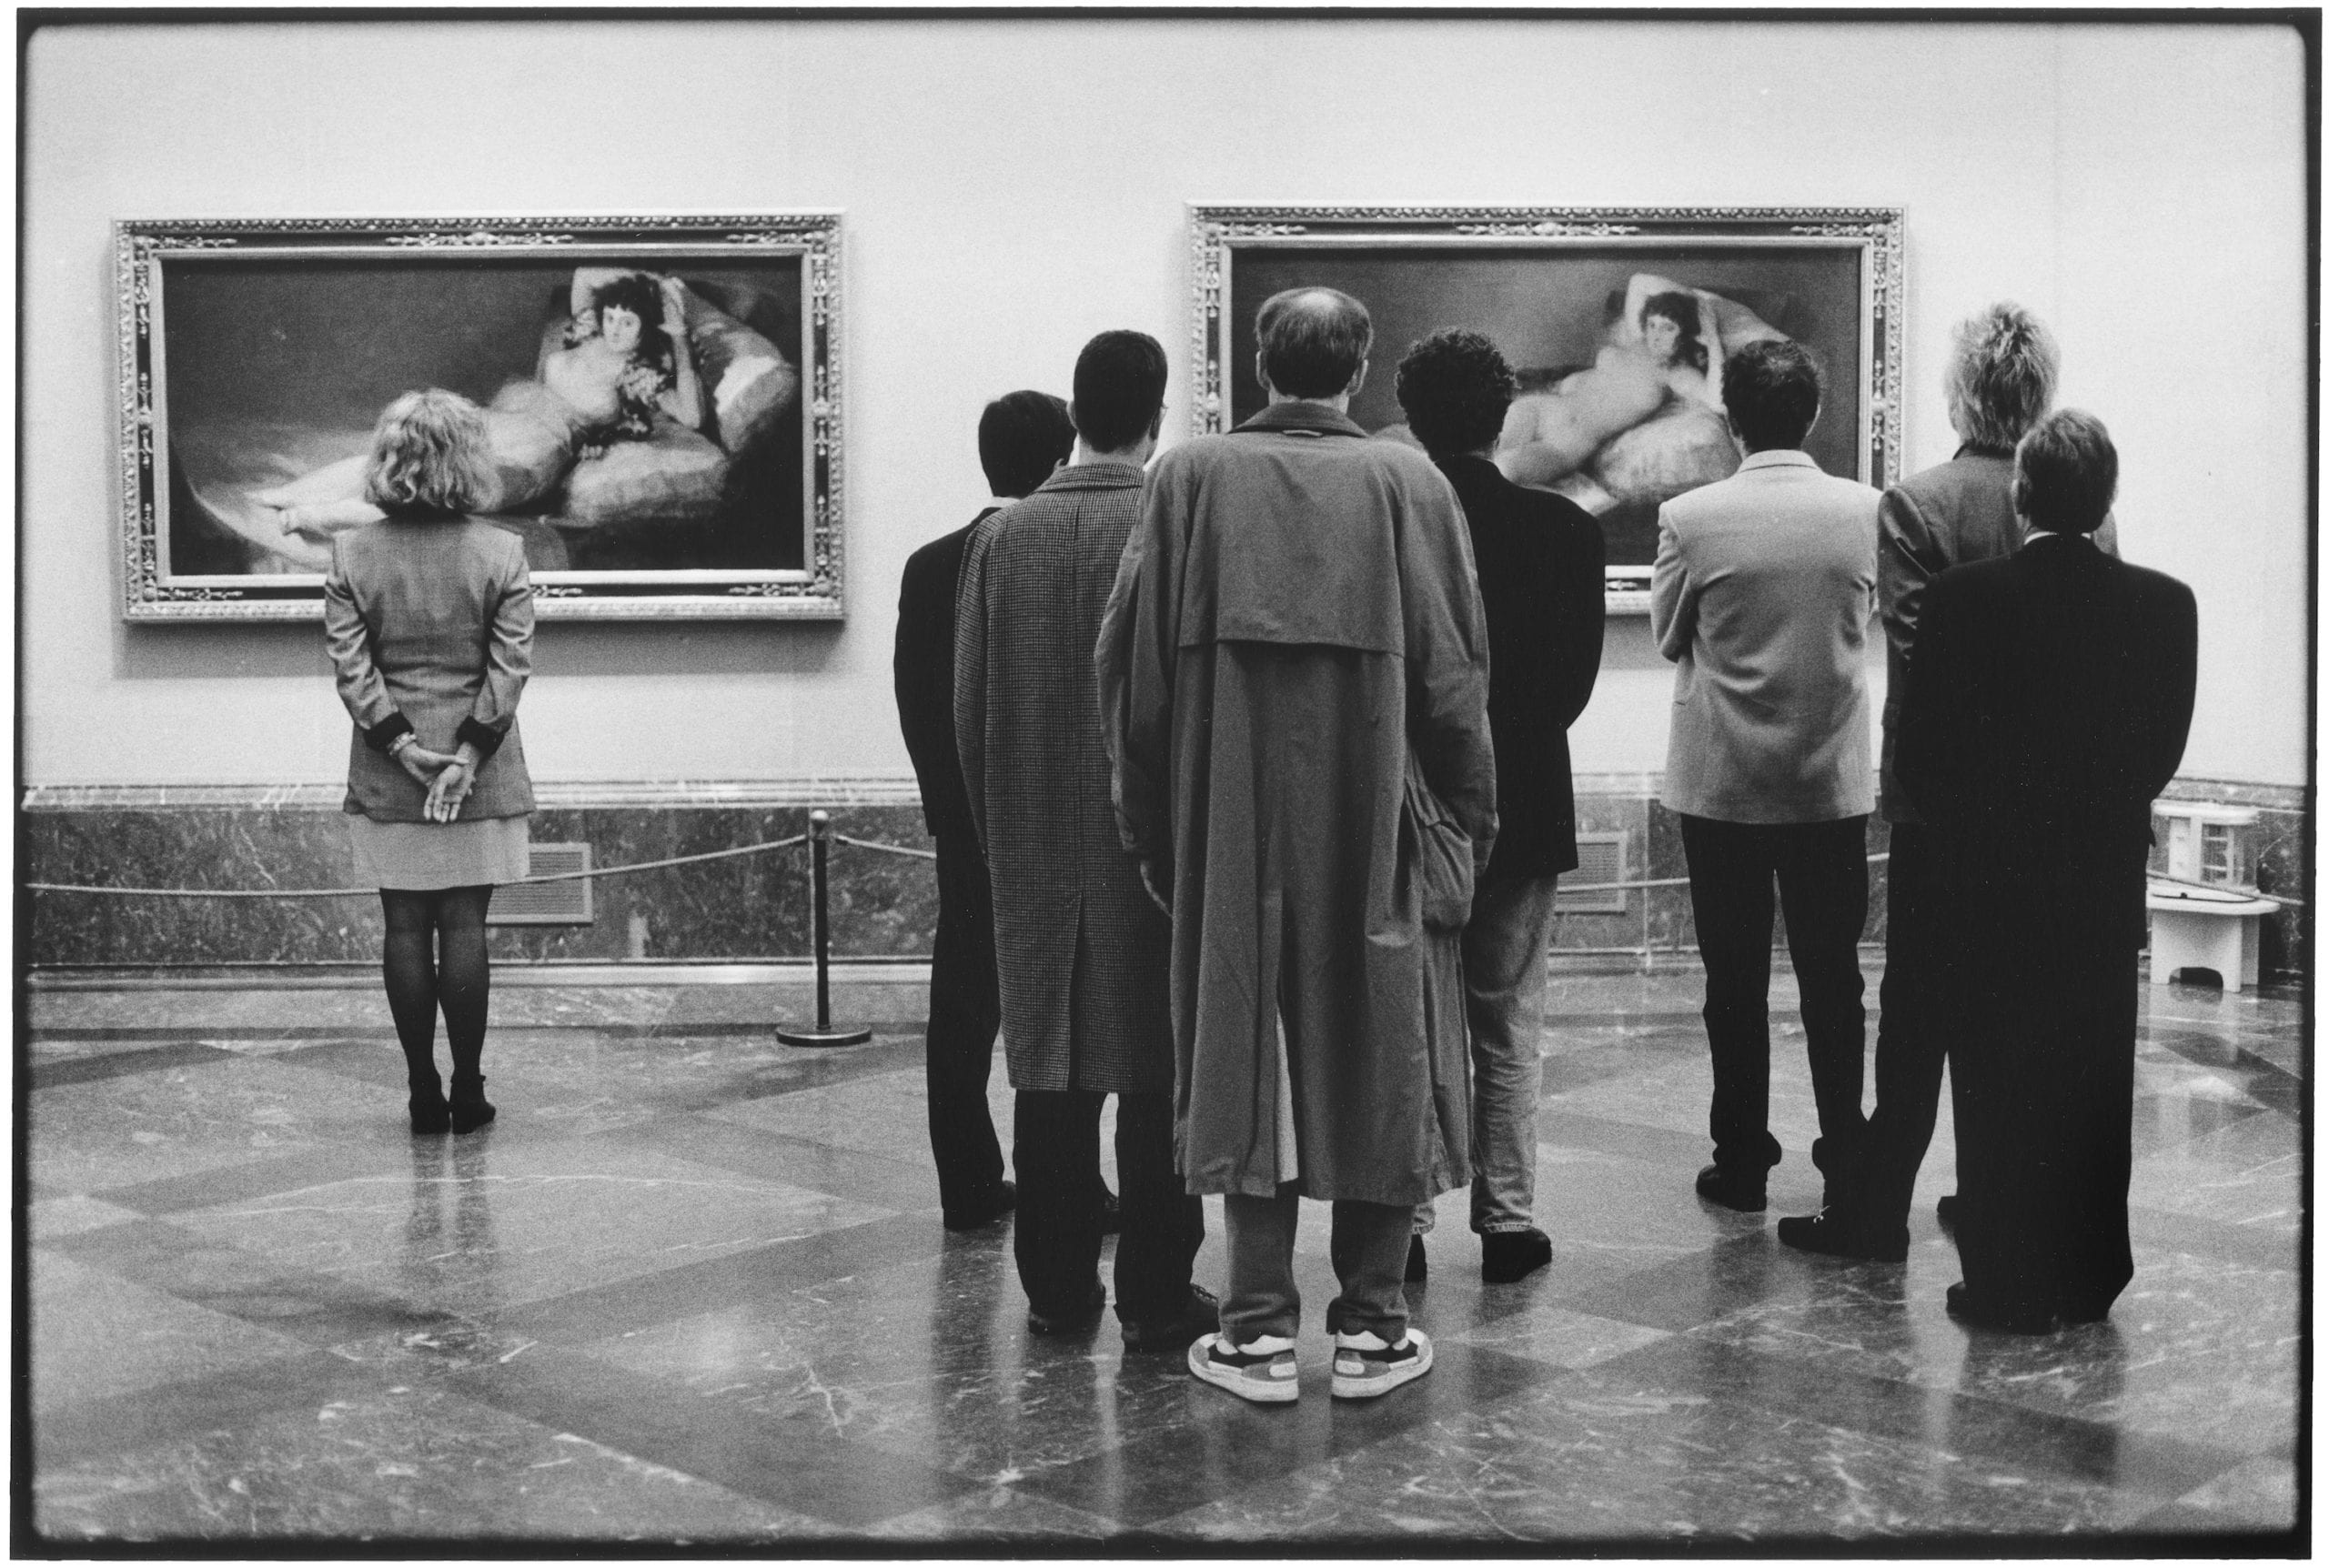 Elliott Erwitt, Madrid, 1995, Prado Museum